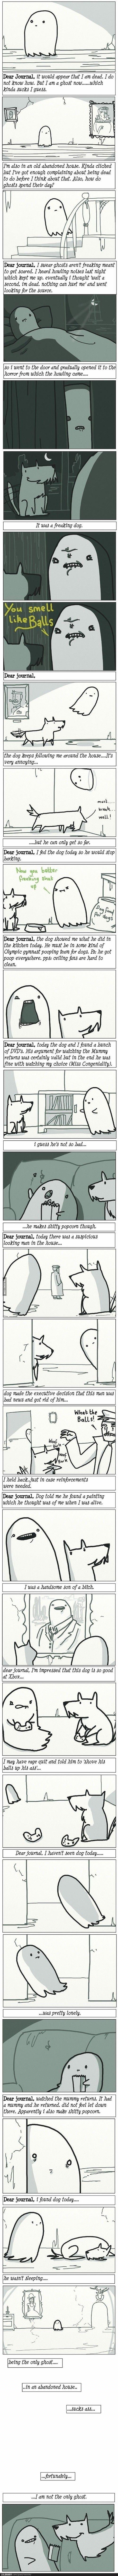 awww!!! Omg this is so cute, hilarious, kinda dumb and a tiny bit sad... I LOVE IT!!